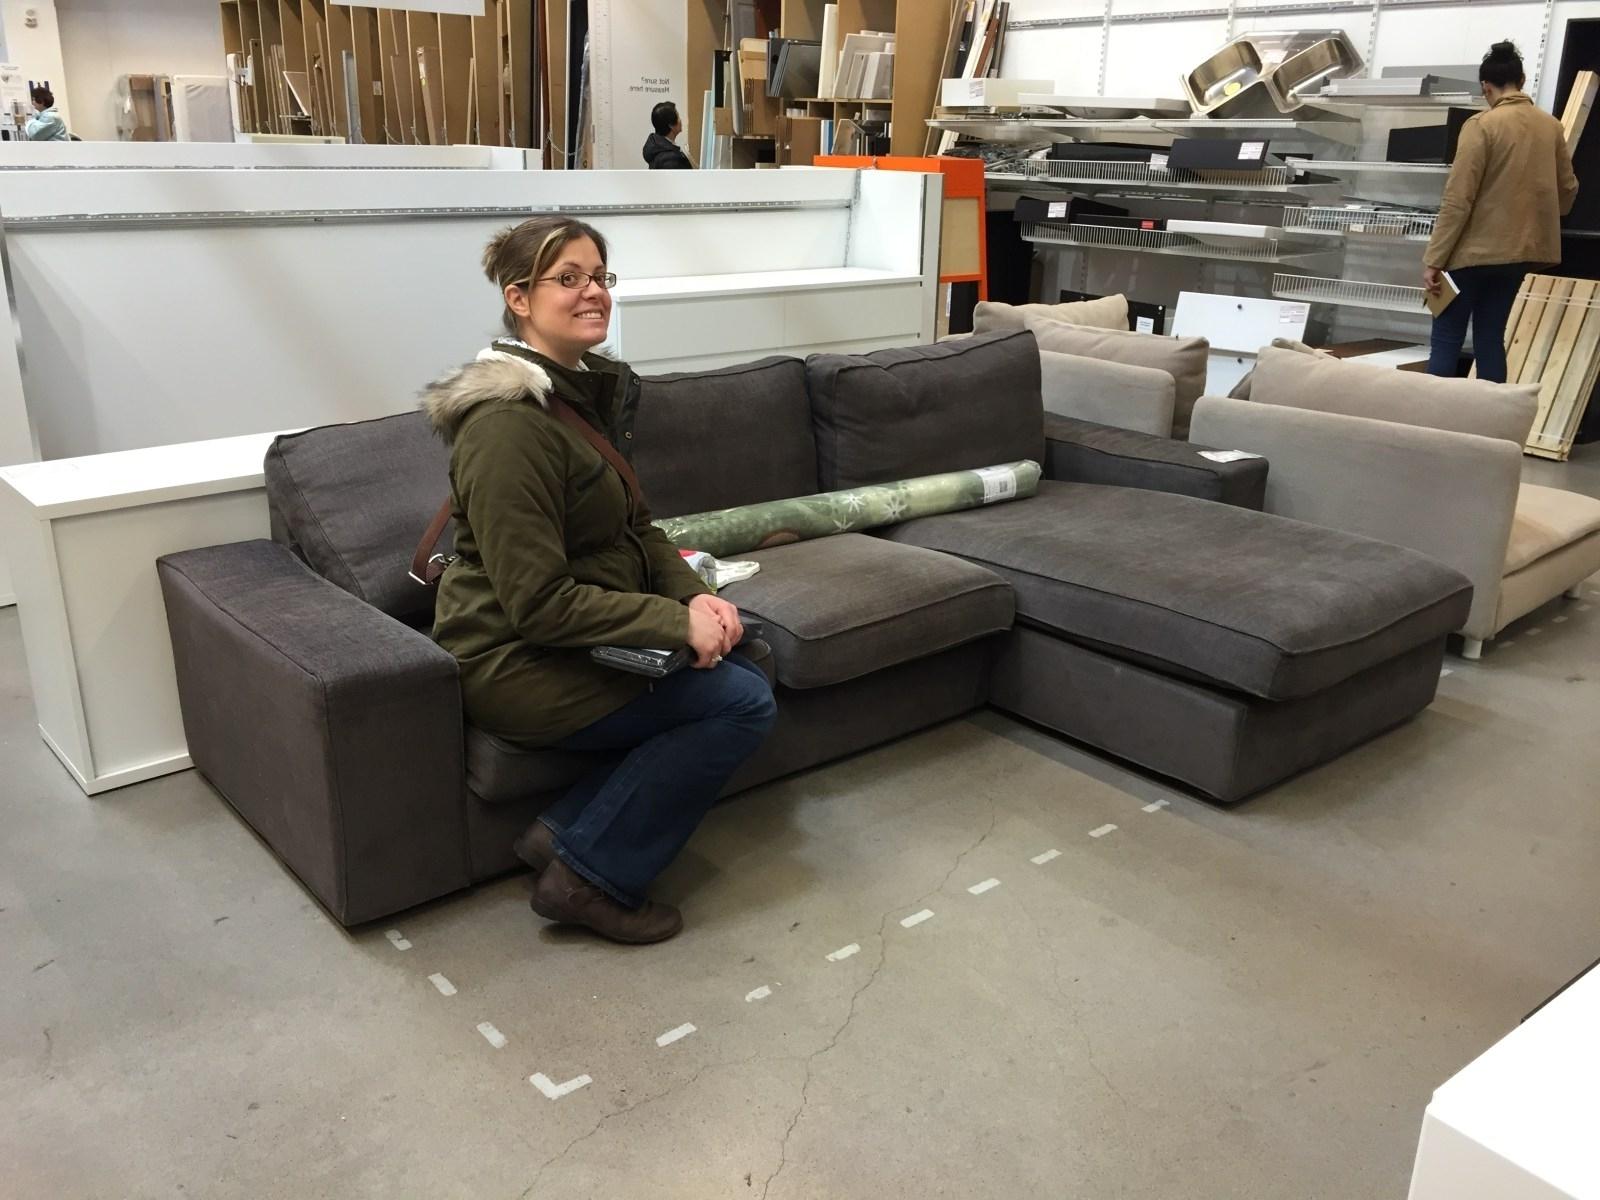 Latest ▻ Sofa : 12 Best Ikea Kivik Sofa Living Room Furniture Decisions Within Kivik Chaises (View 9 of 15)